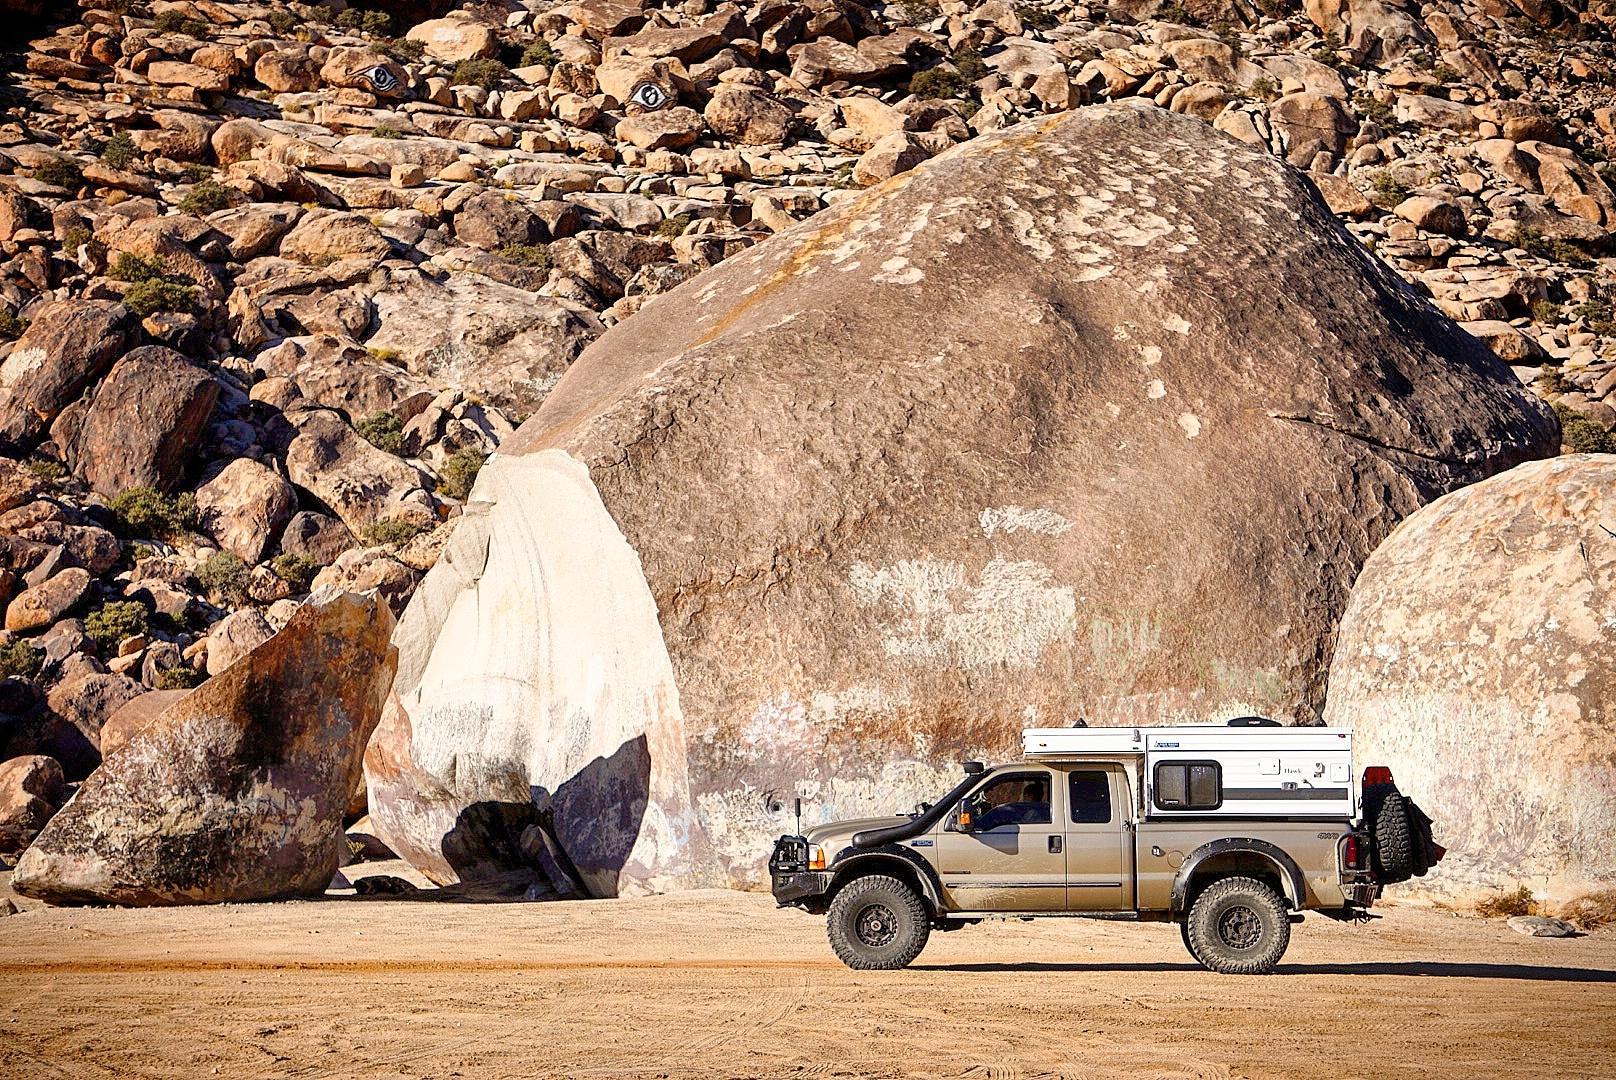 Gramp Camp: Jon Burtt's 7.3L Overland Truck Camper – Expedition Portal